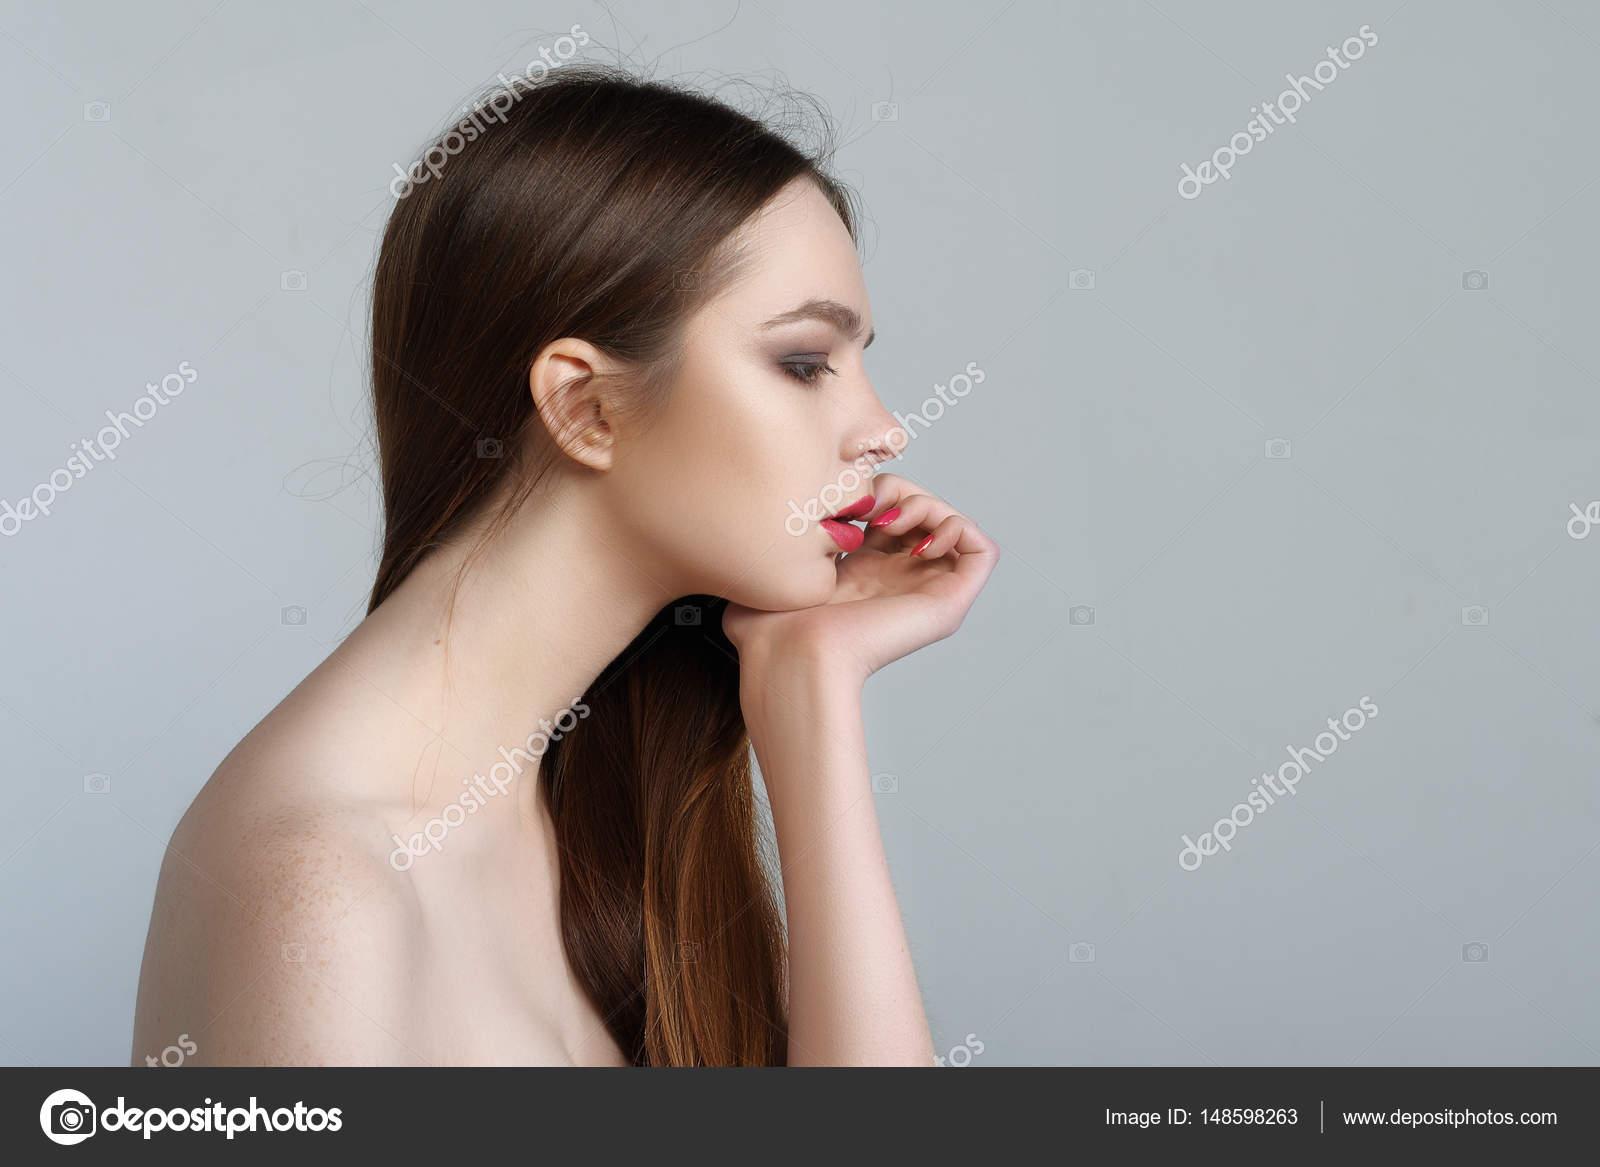 hals flicka bild